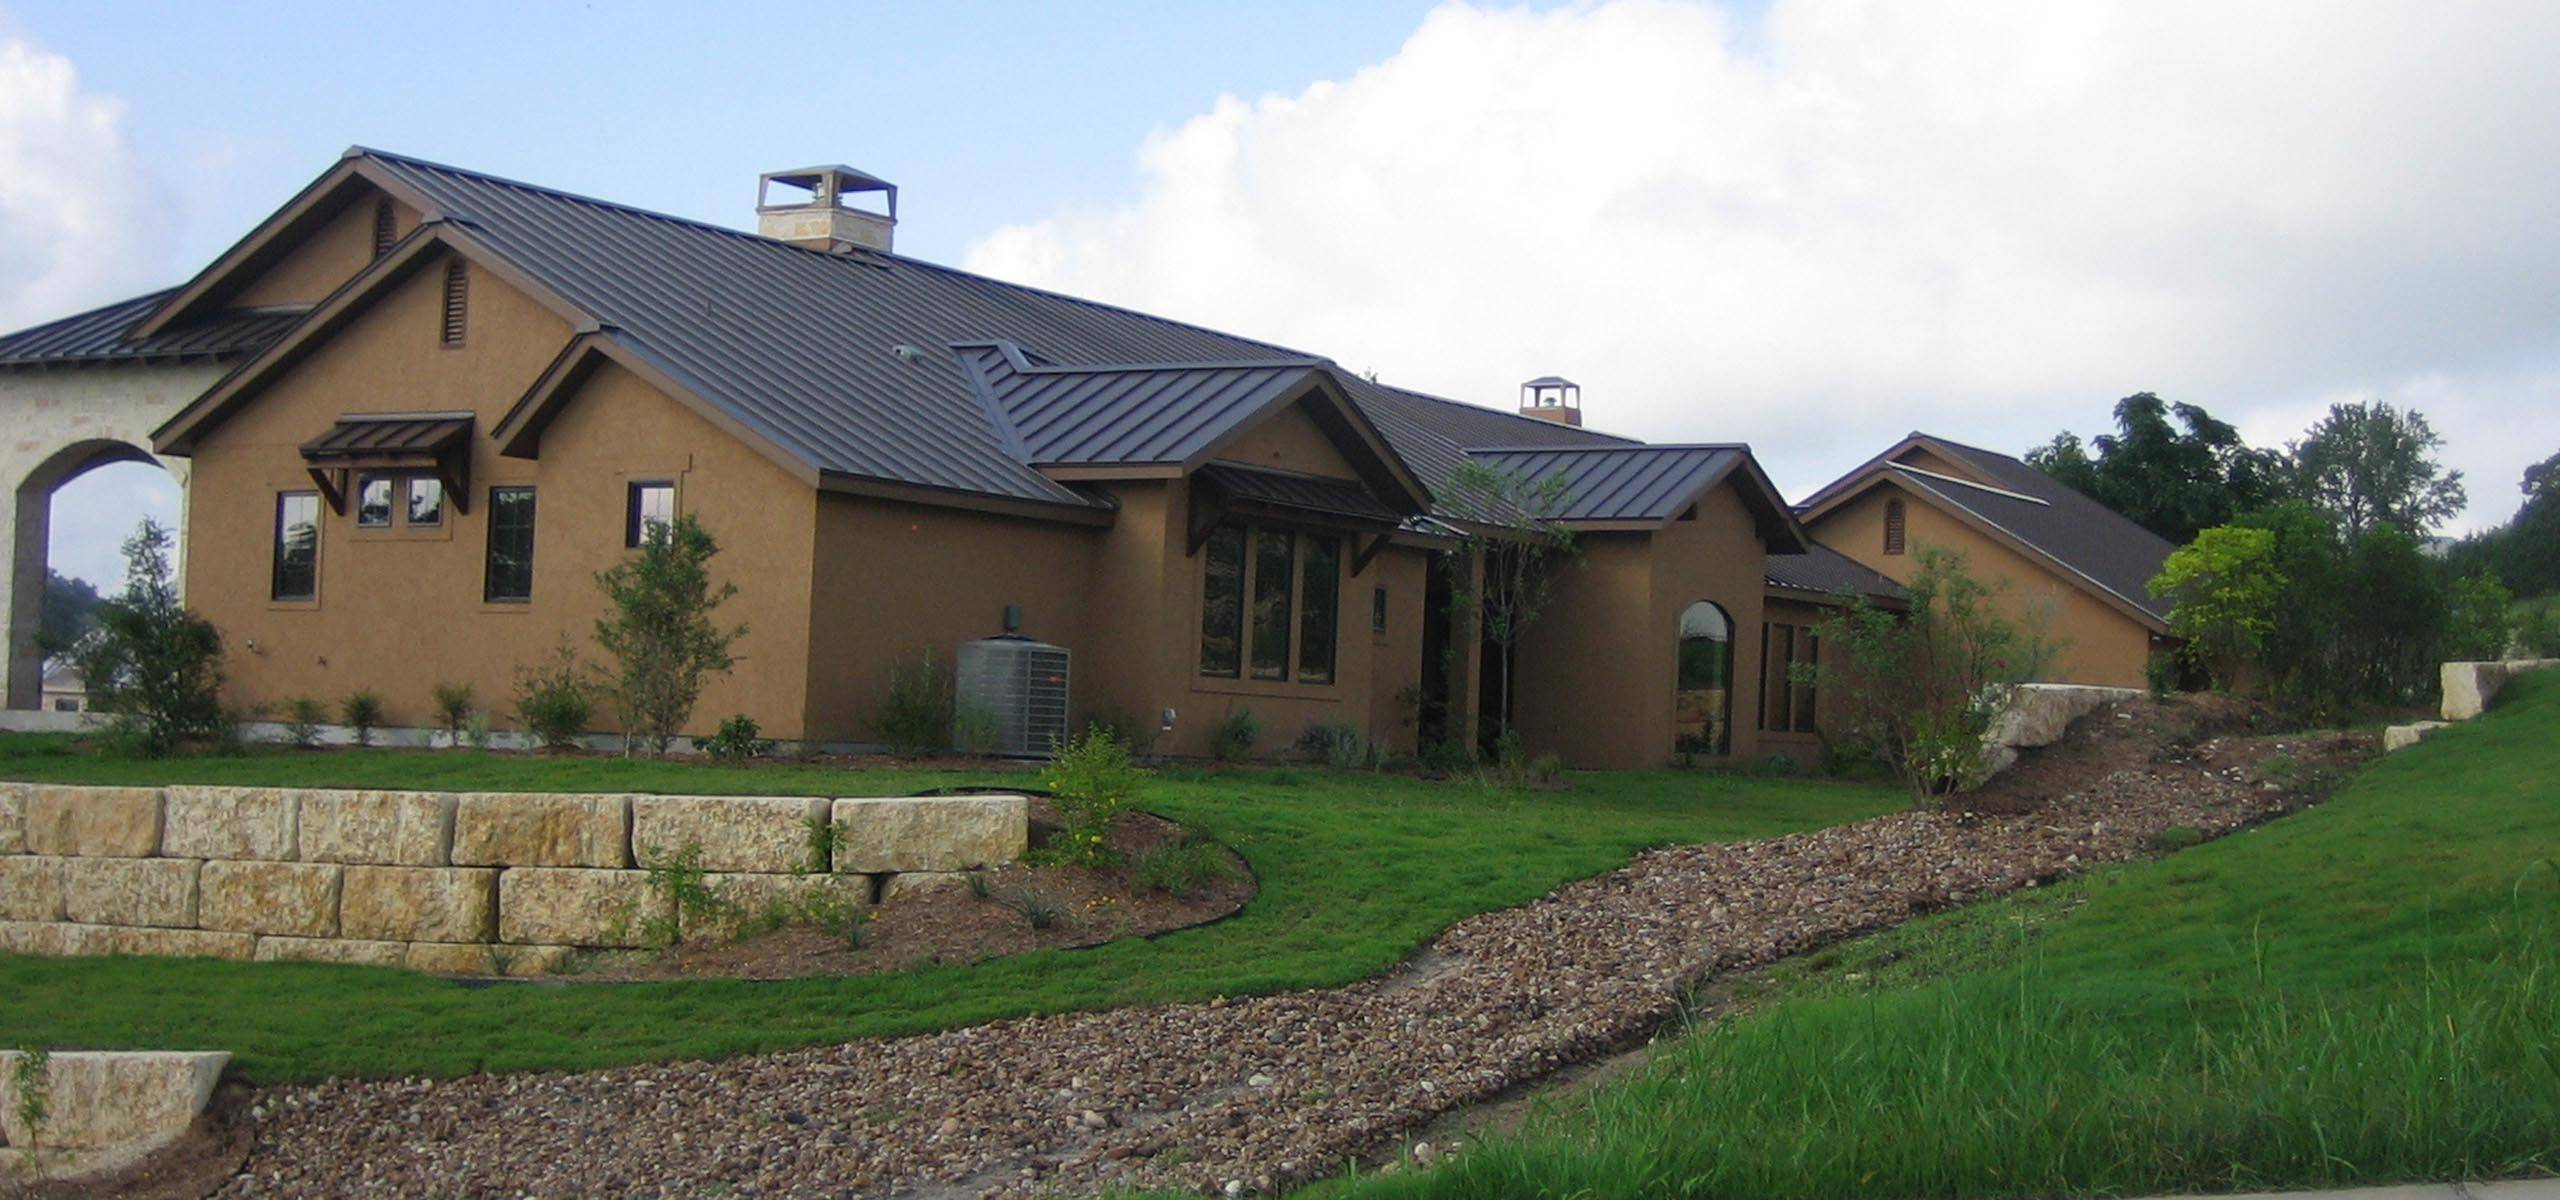 Executive Homes Texas Home Plans